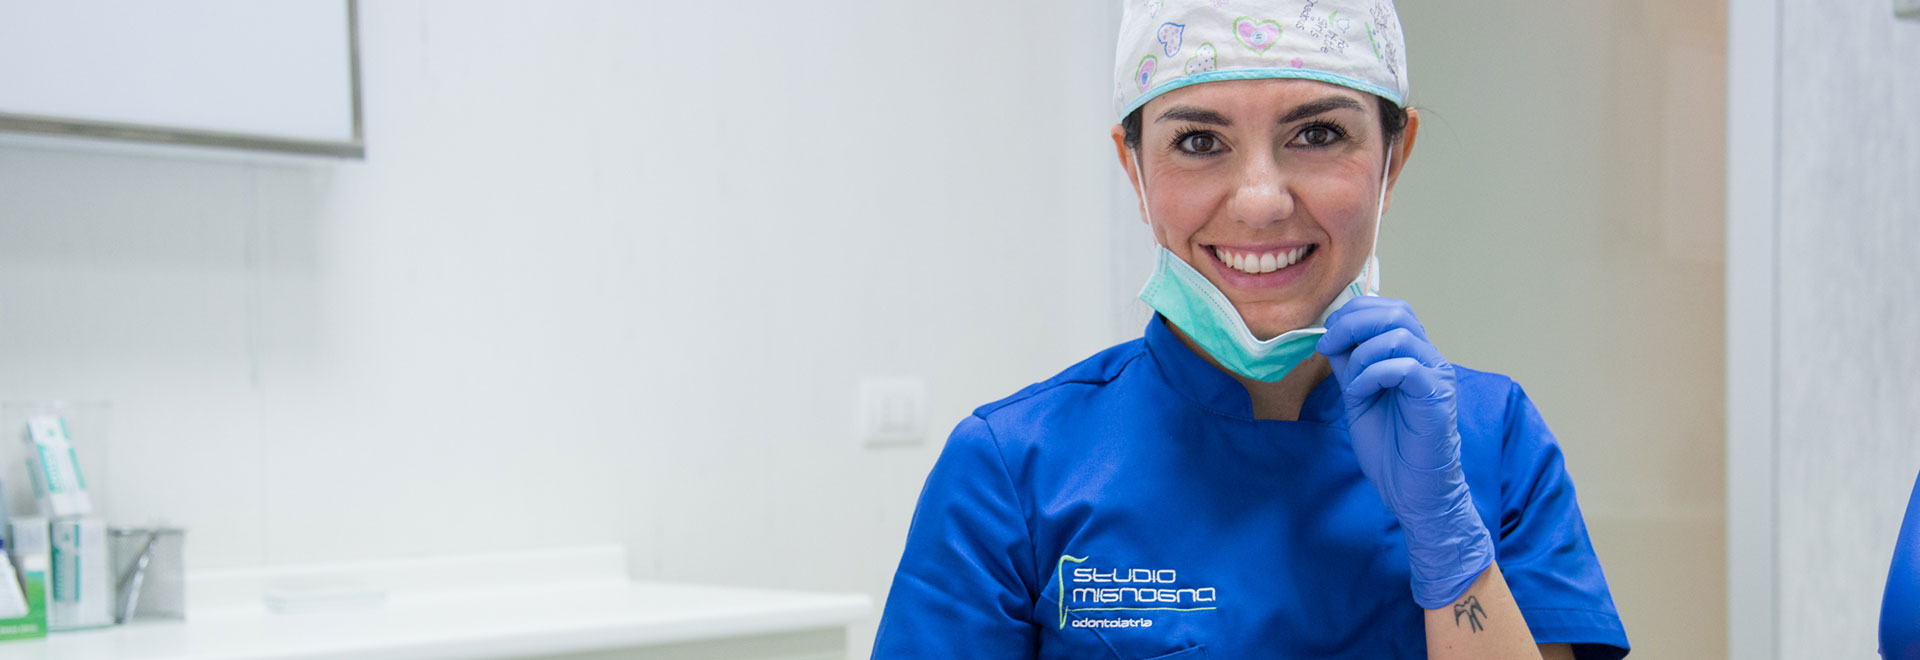 Studio Odontoiatrico Mignogna